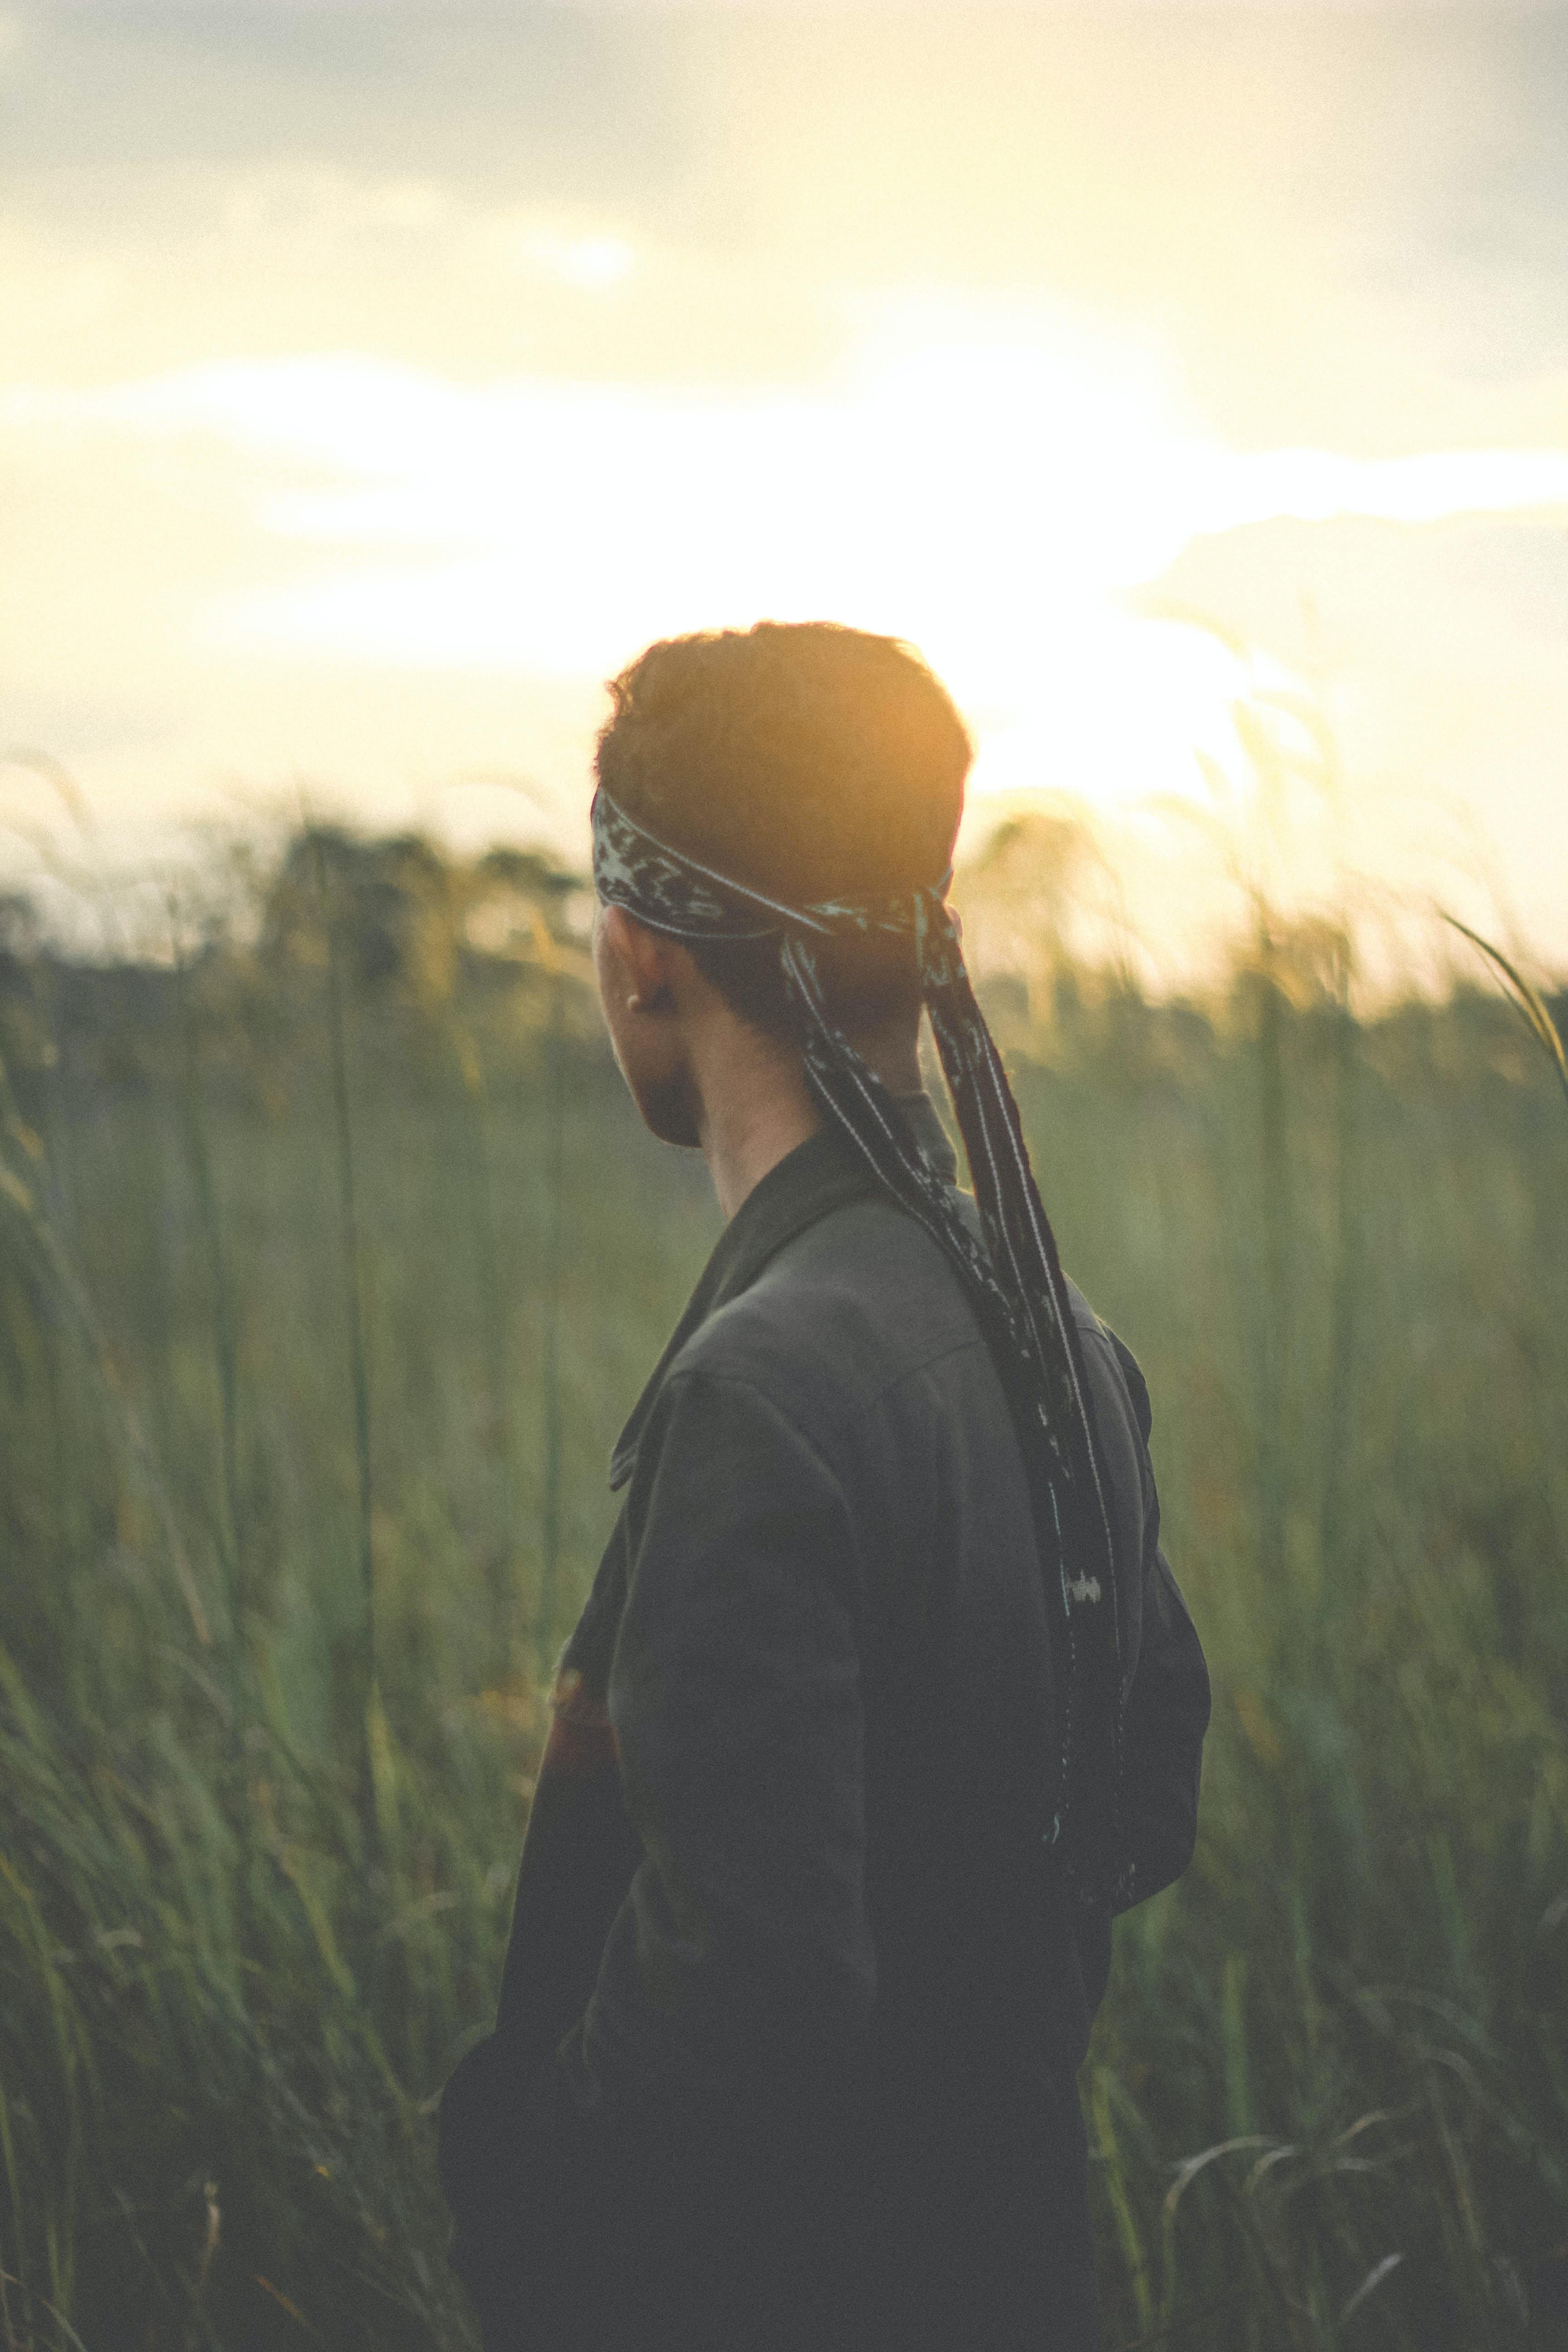 photography of man with bandana looking at grass